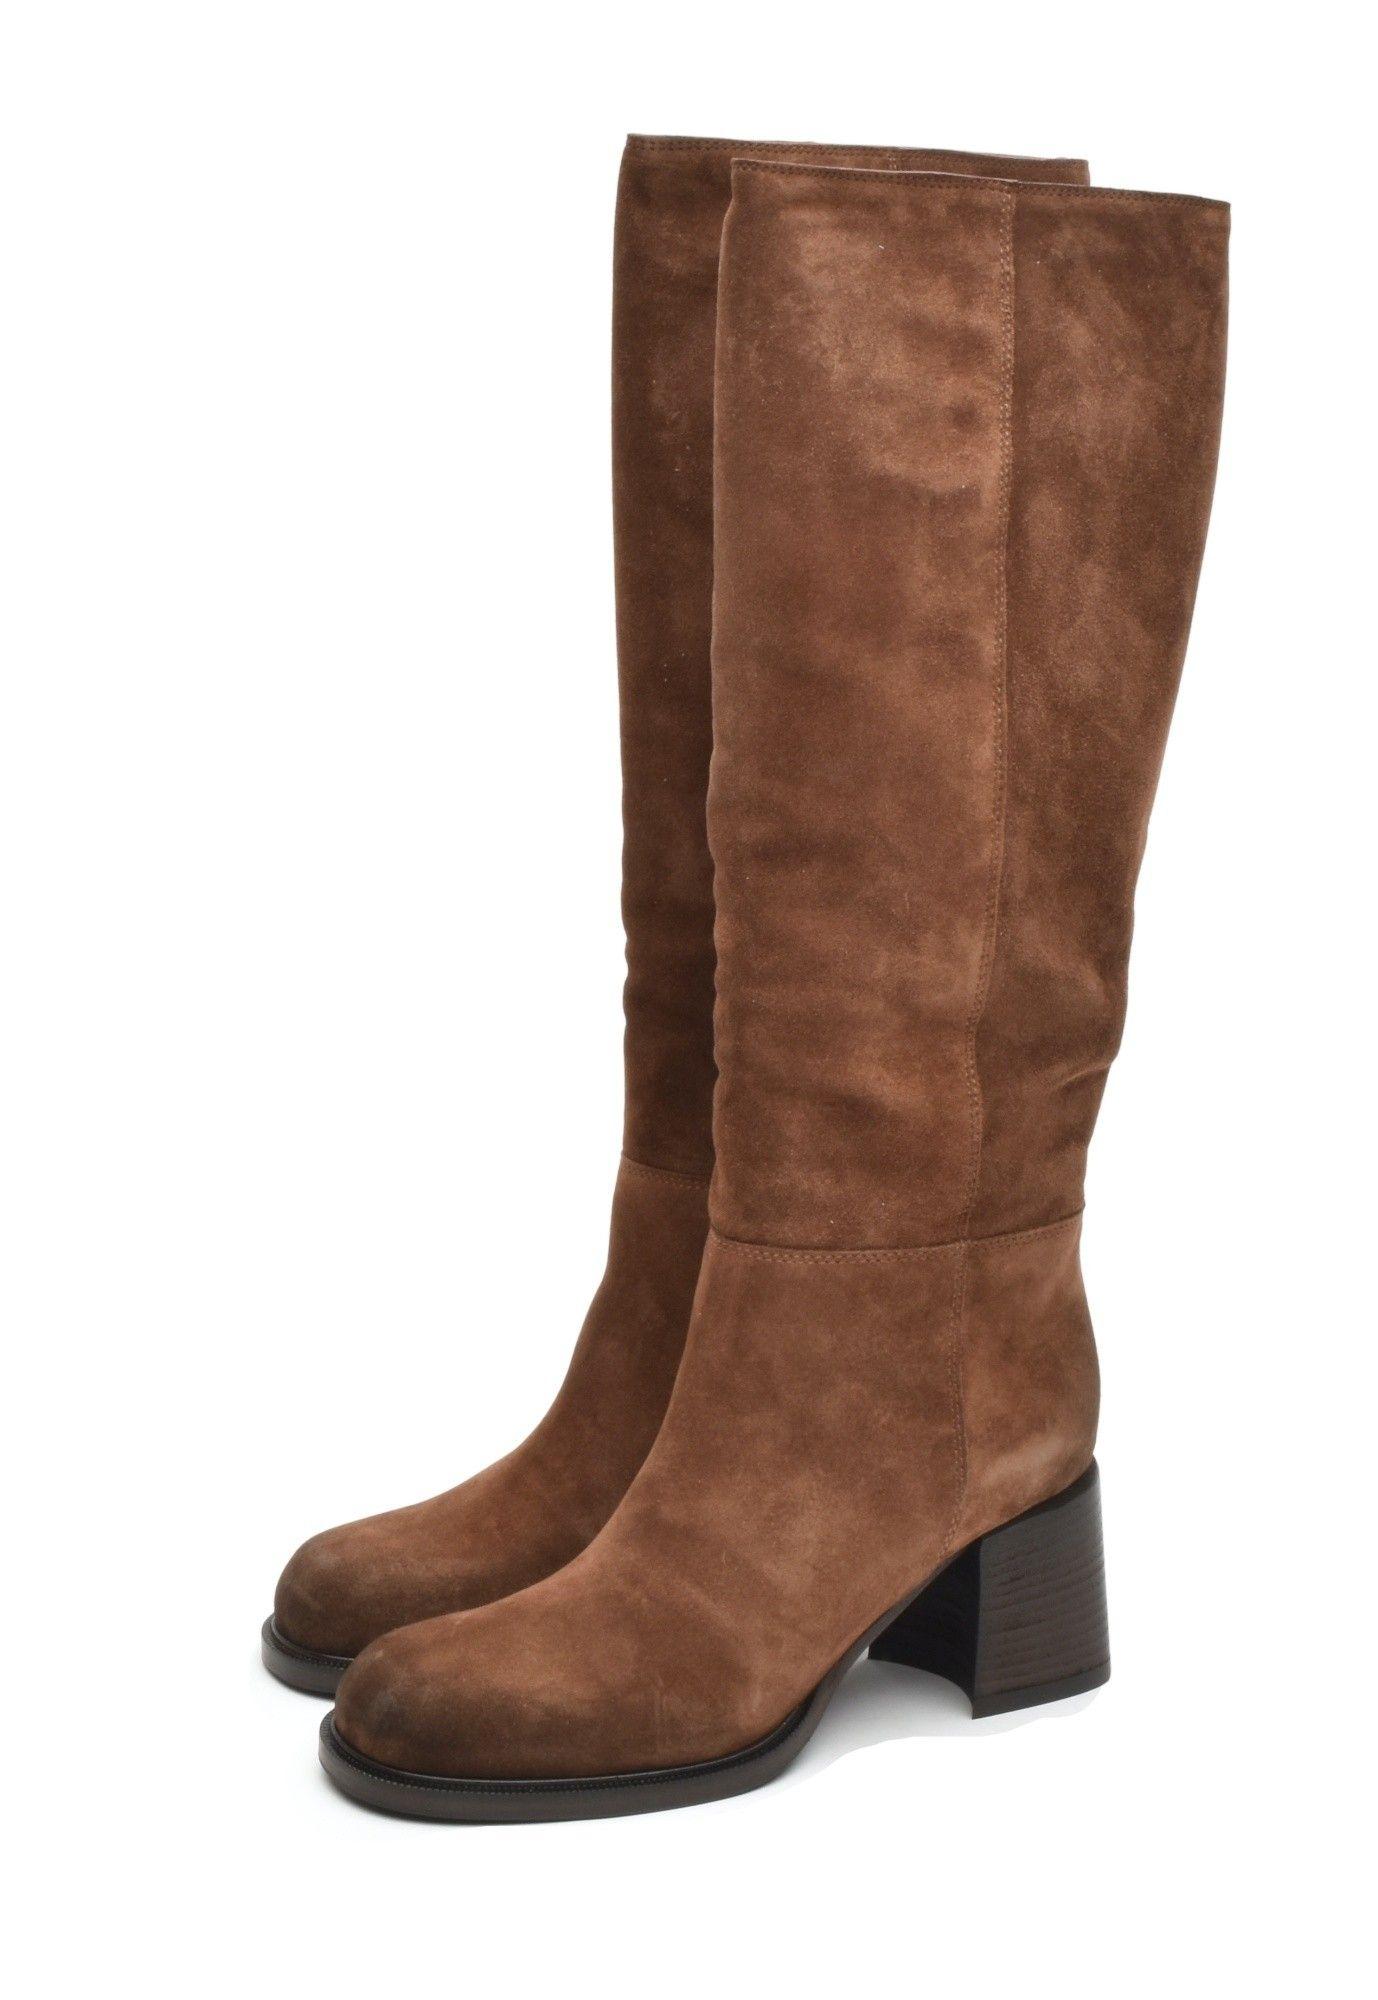 VIC MATIÉ - Damen Schuhe - Stivale Sensory - Brown